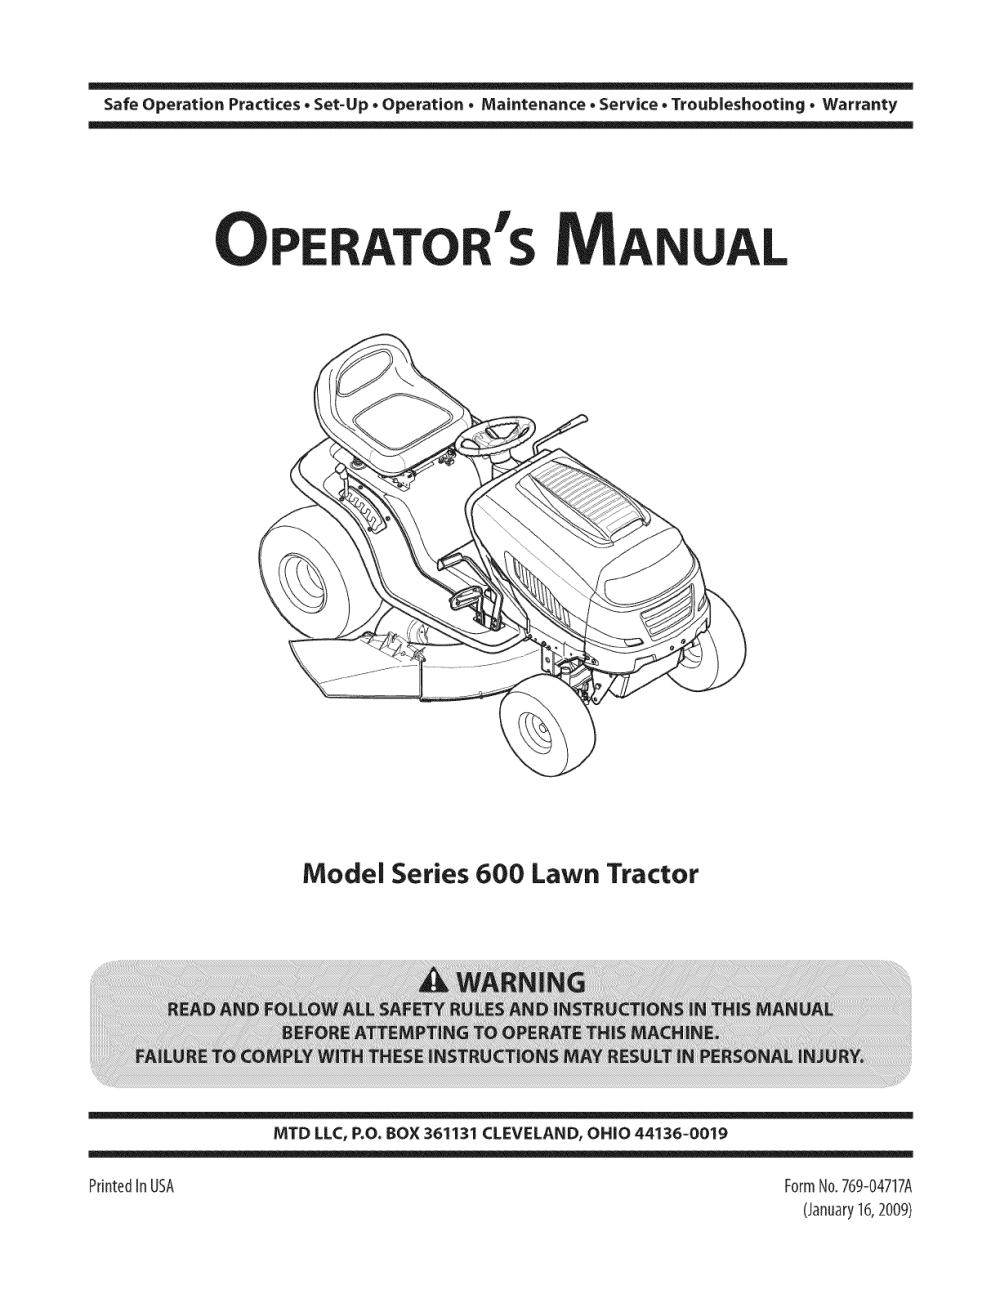 medium resolution of  array mtd 13al605h057 user manual tractor manuals and guides 1109241l rh usermanual wiki